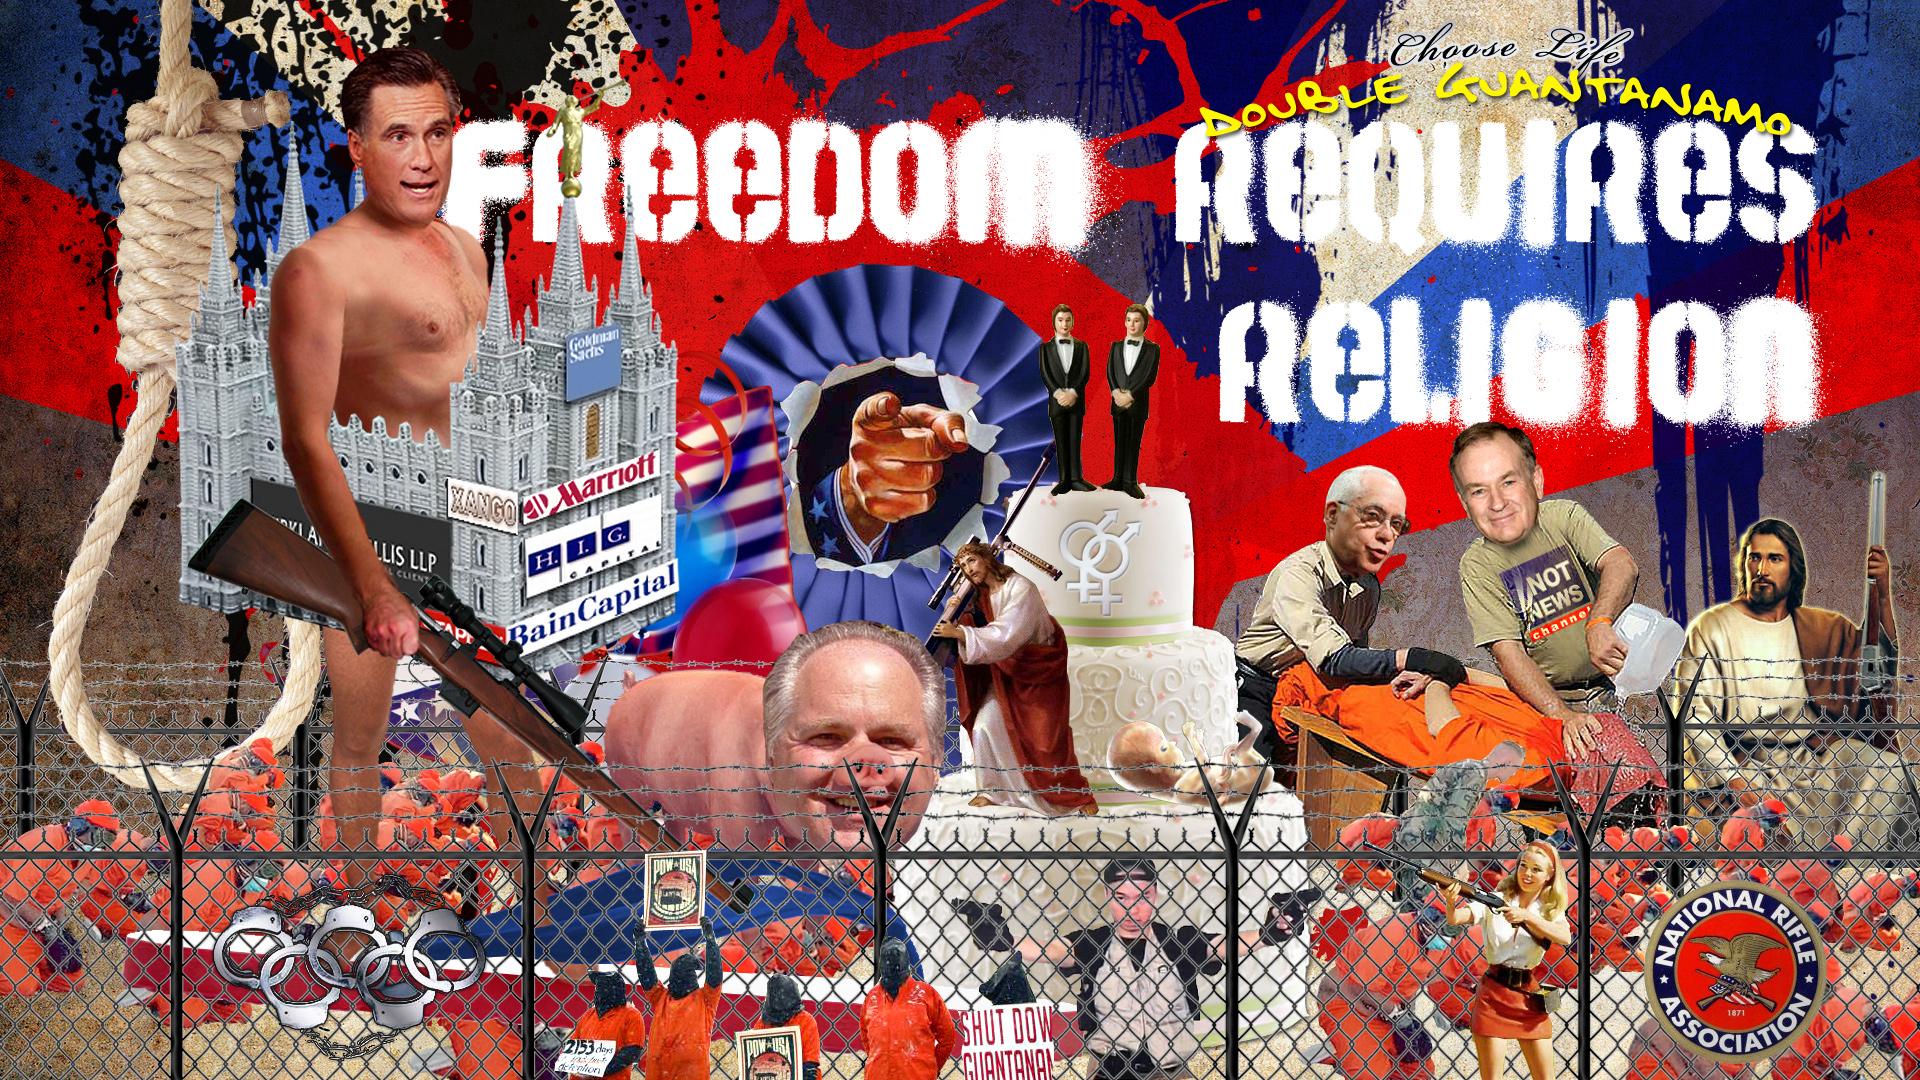 Romney-Guantanamo